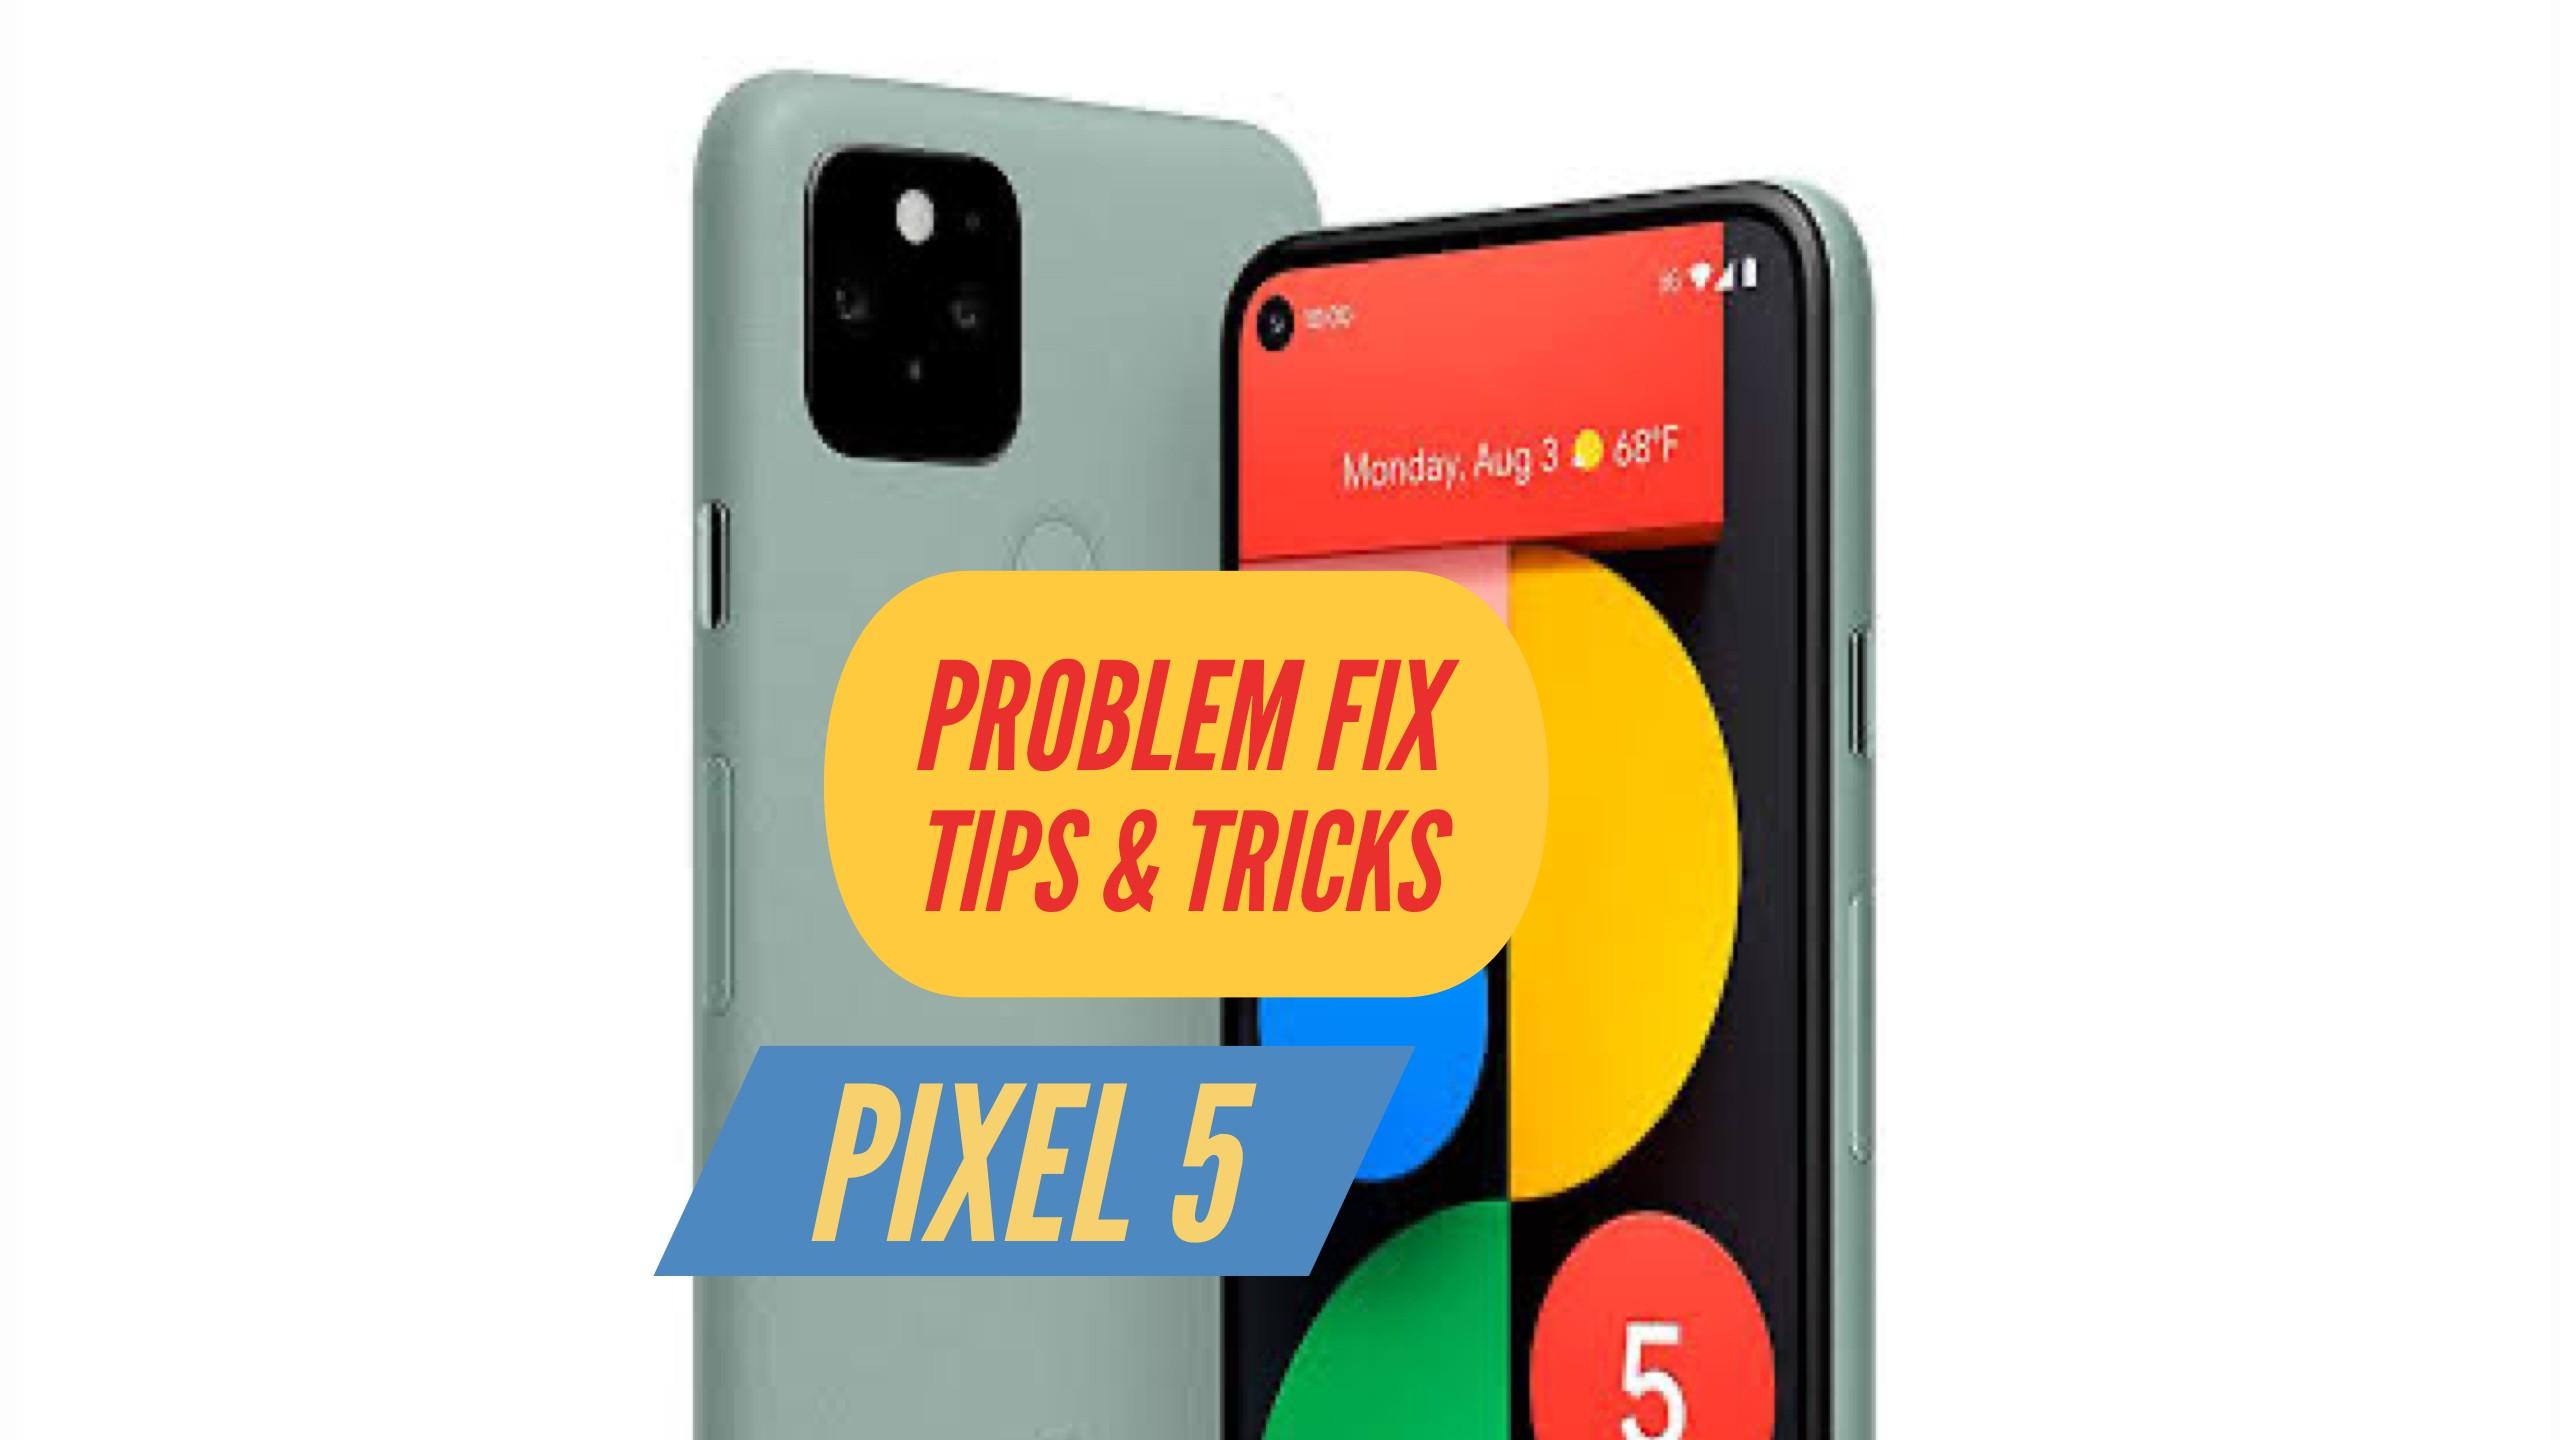 Pixel 5nProblem FIx Issues SOlution TIPS & TRICKS